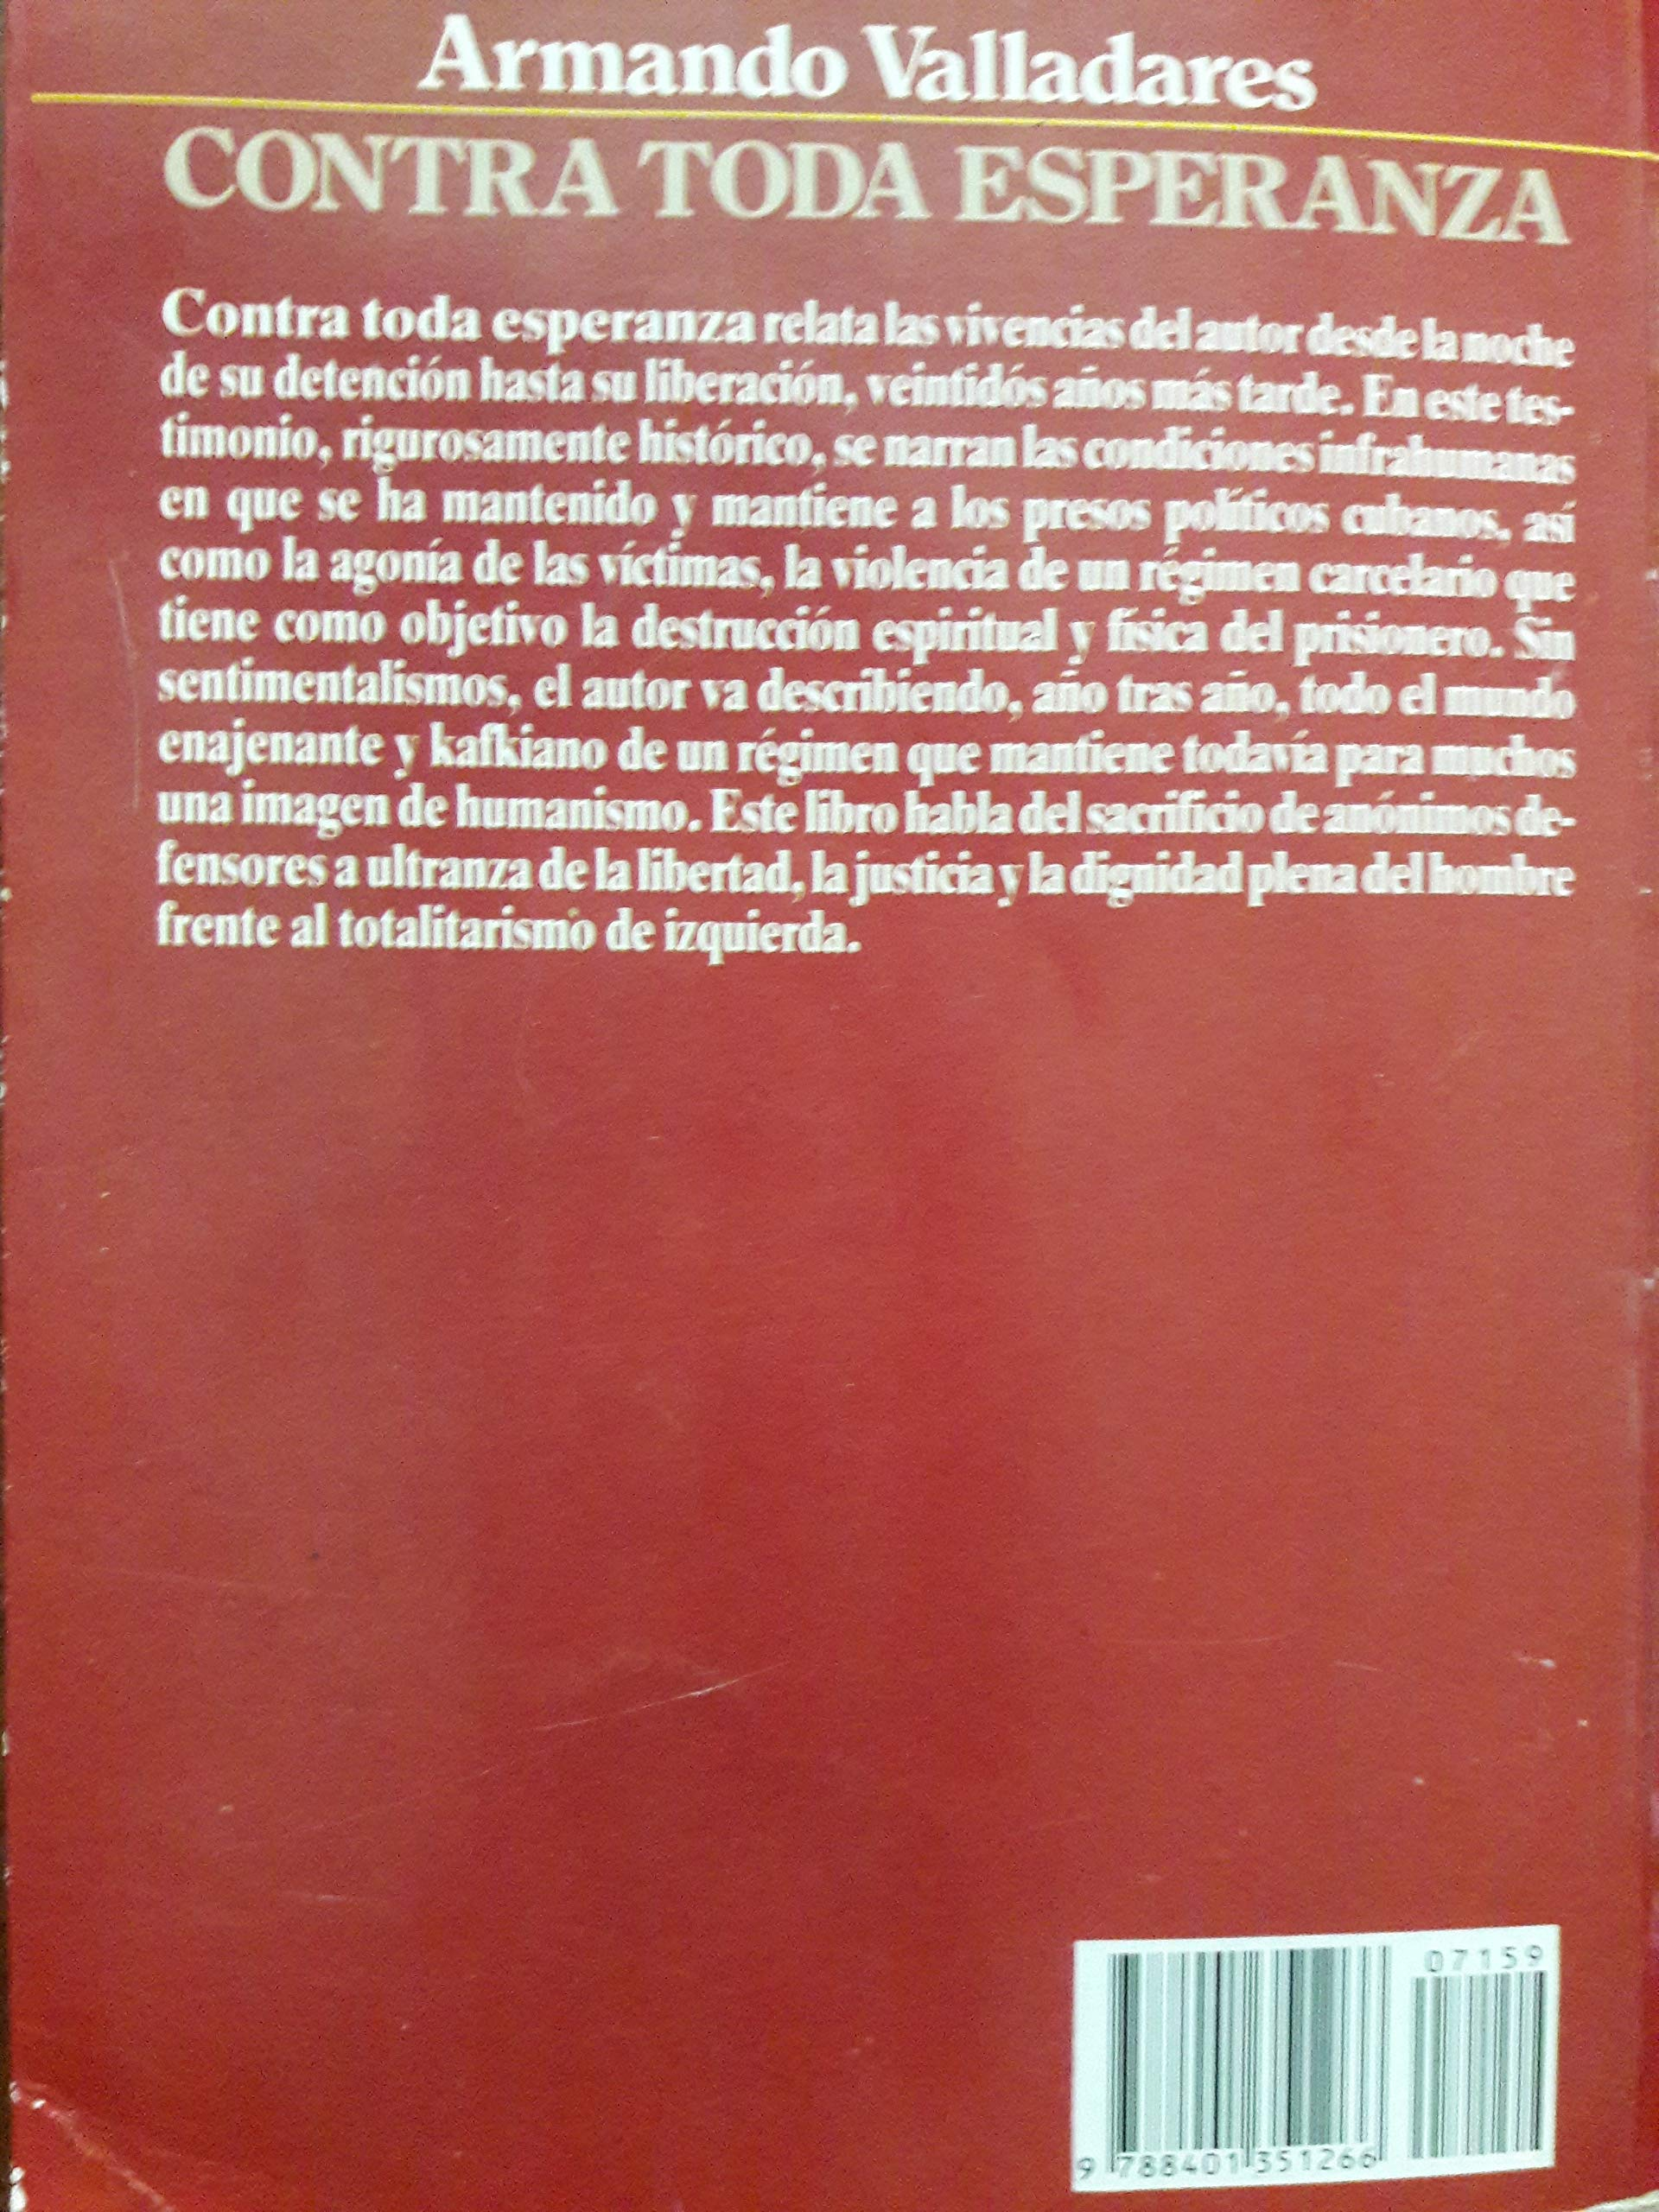 ARMANDO VALLADARES - MIS MEMORIAS: ARMANDO VALLADARES: Amazon.com: Books